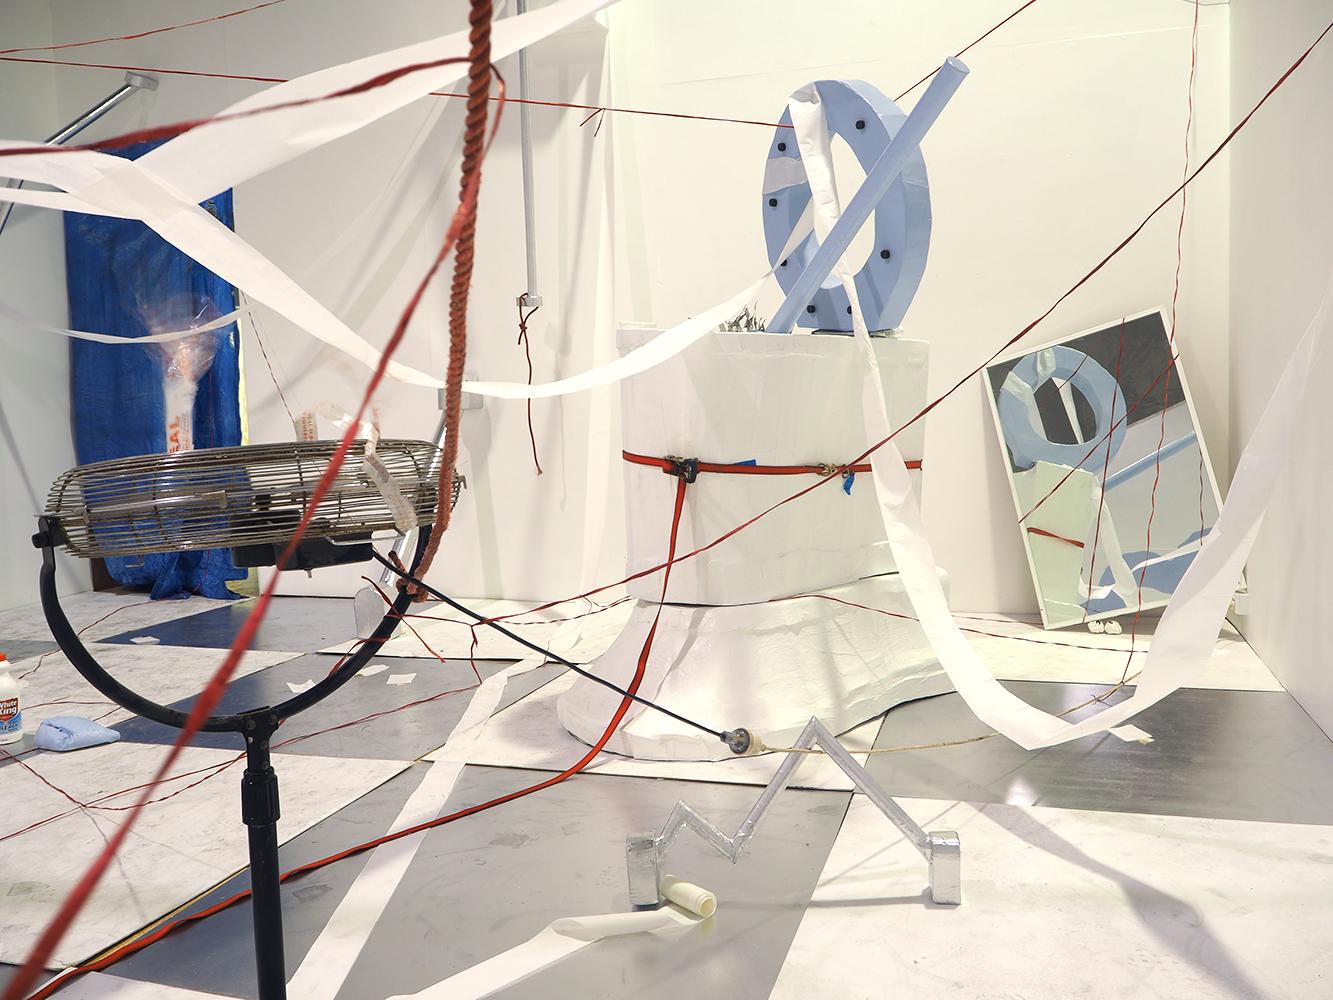 contemporary art, Australian artist, Perth artist, painting, futuristic, gradient, exhibition, disabled artist